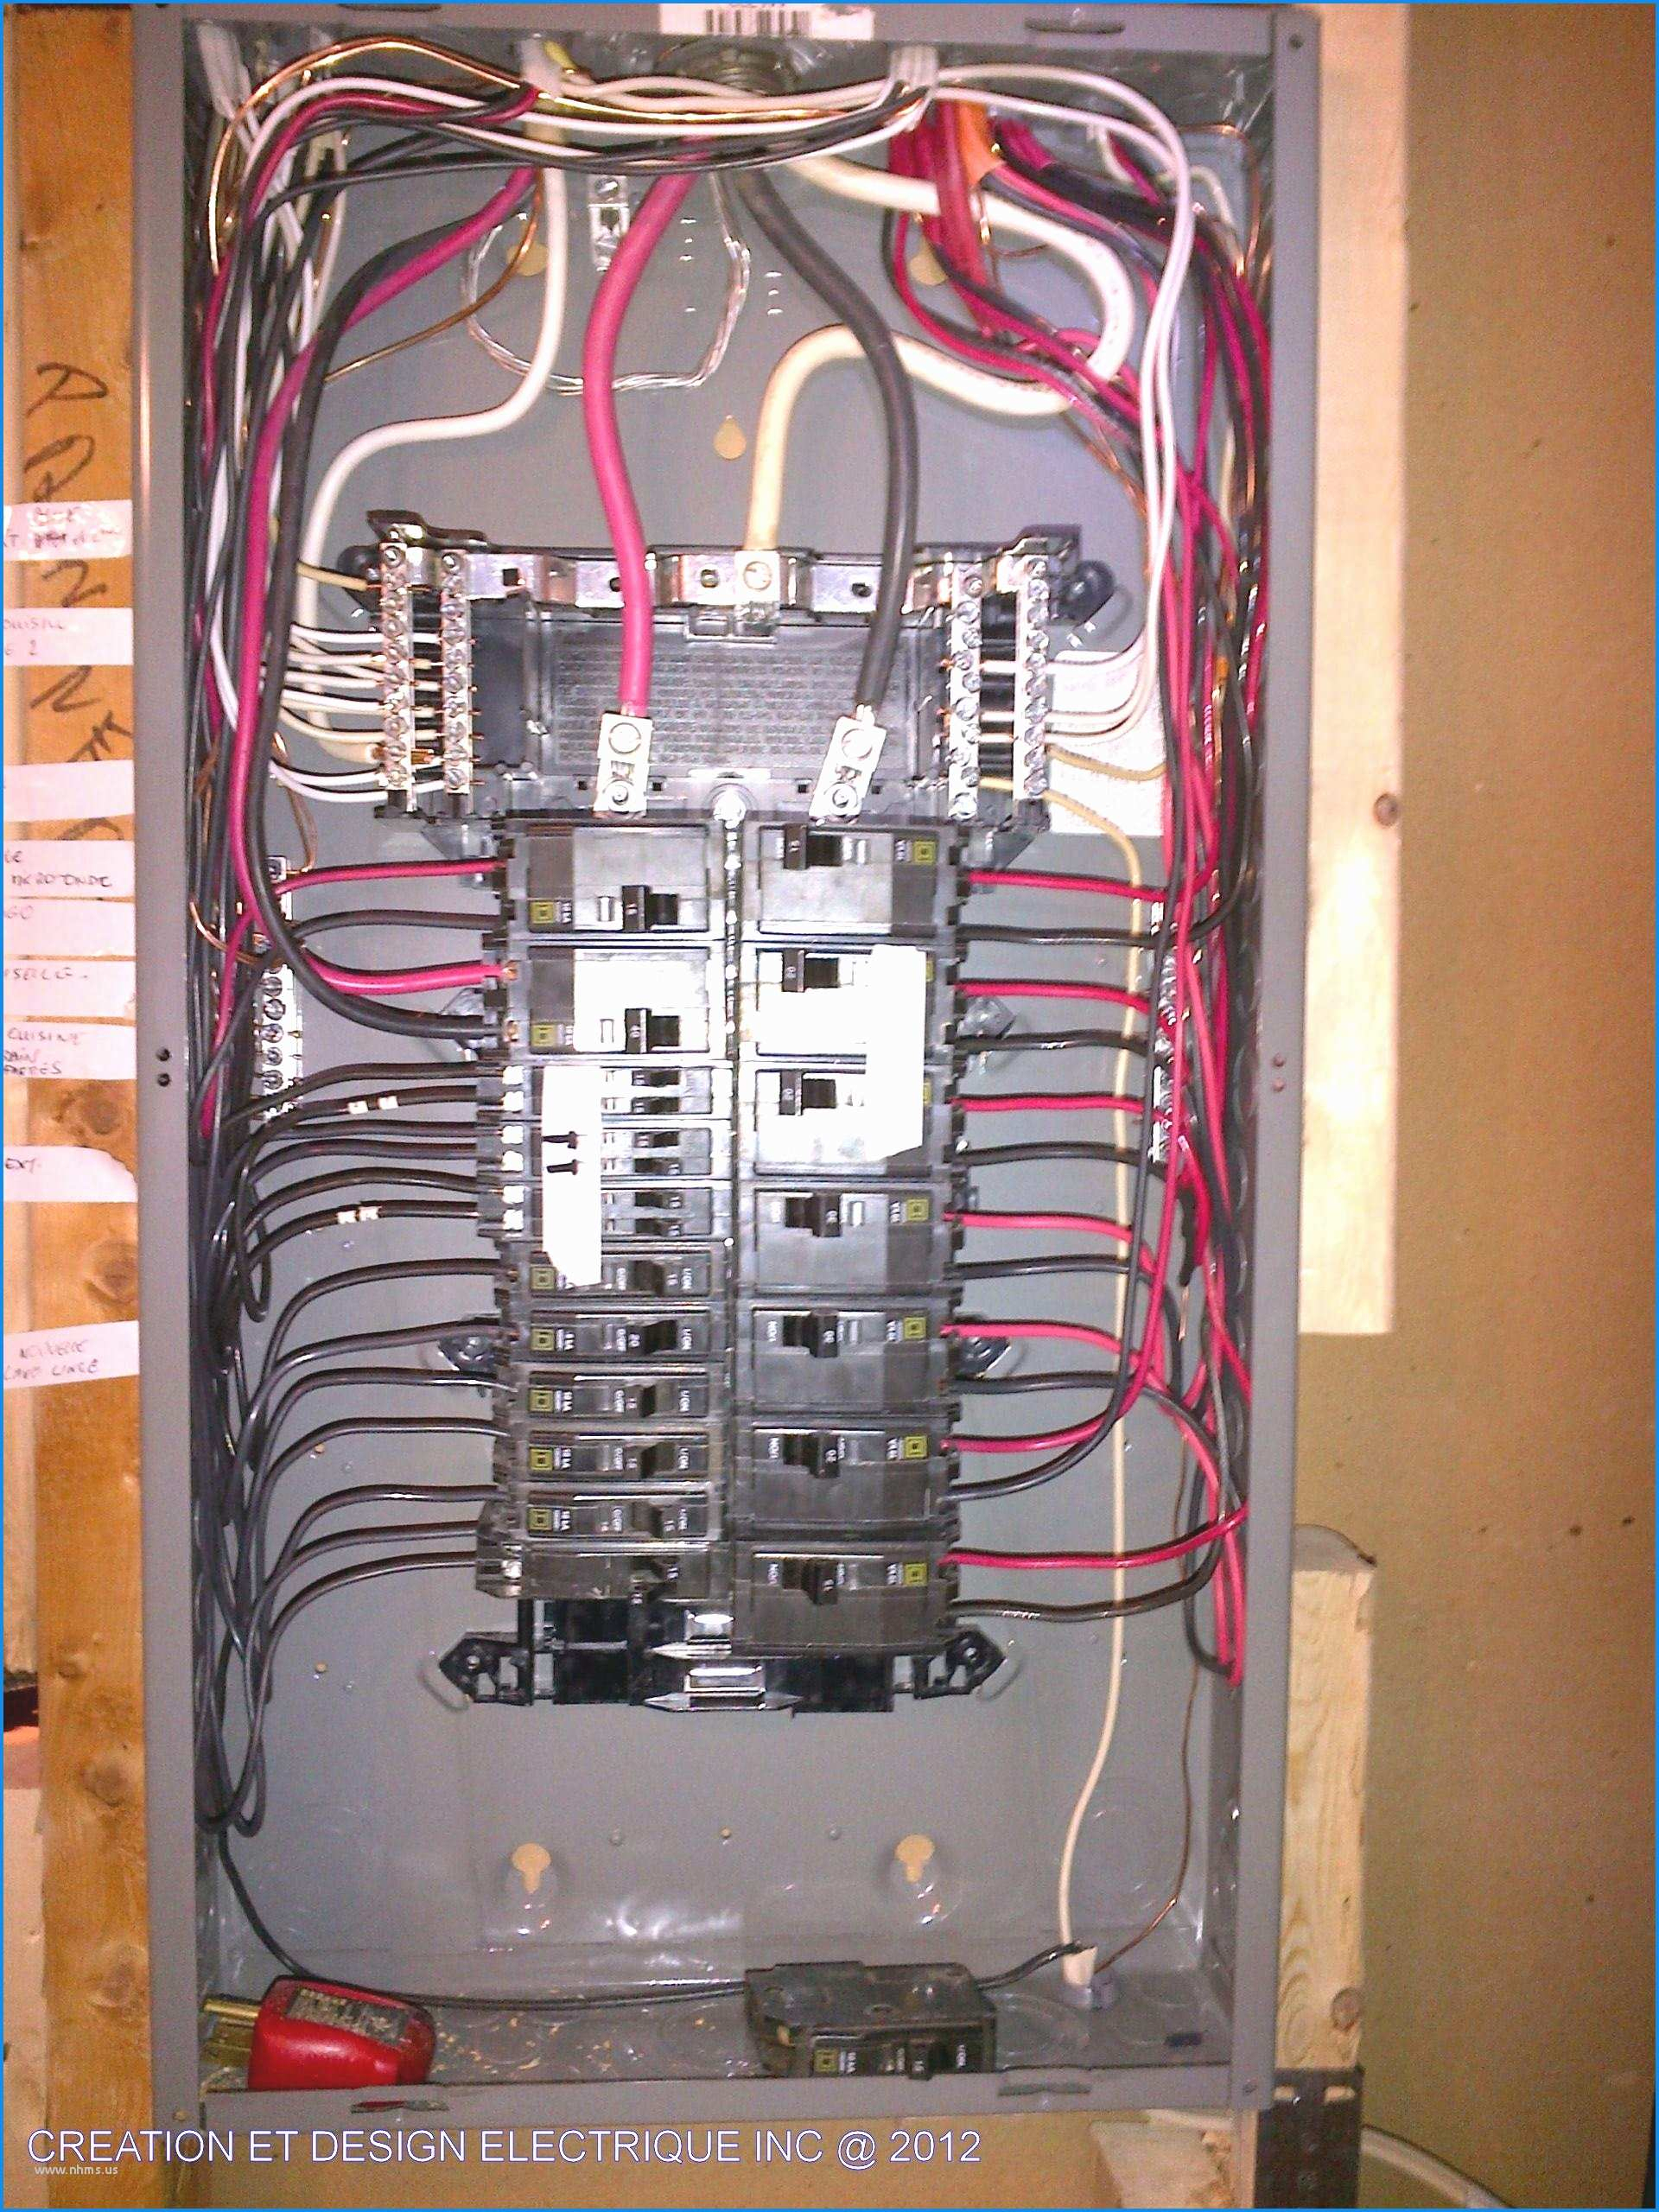 100 Amp Homeline Load Center Wiring Diagram | Wiring Diagram - Homeline Load Center Wiring Diagram